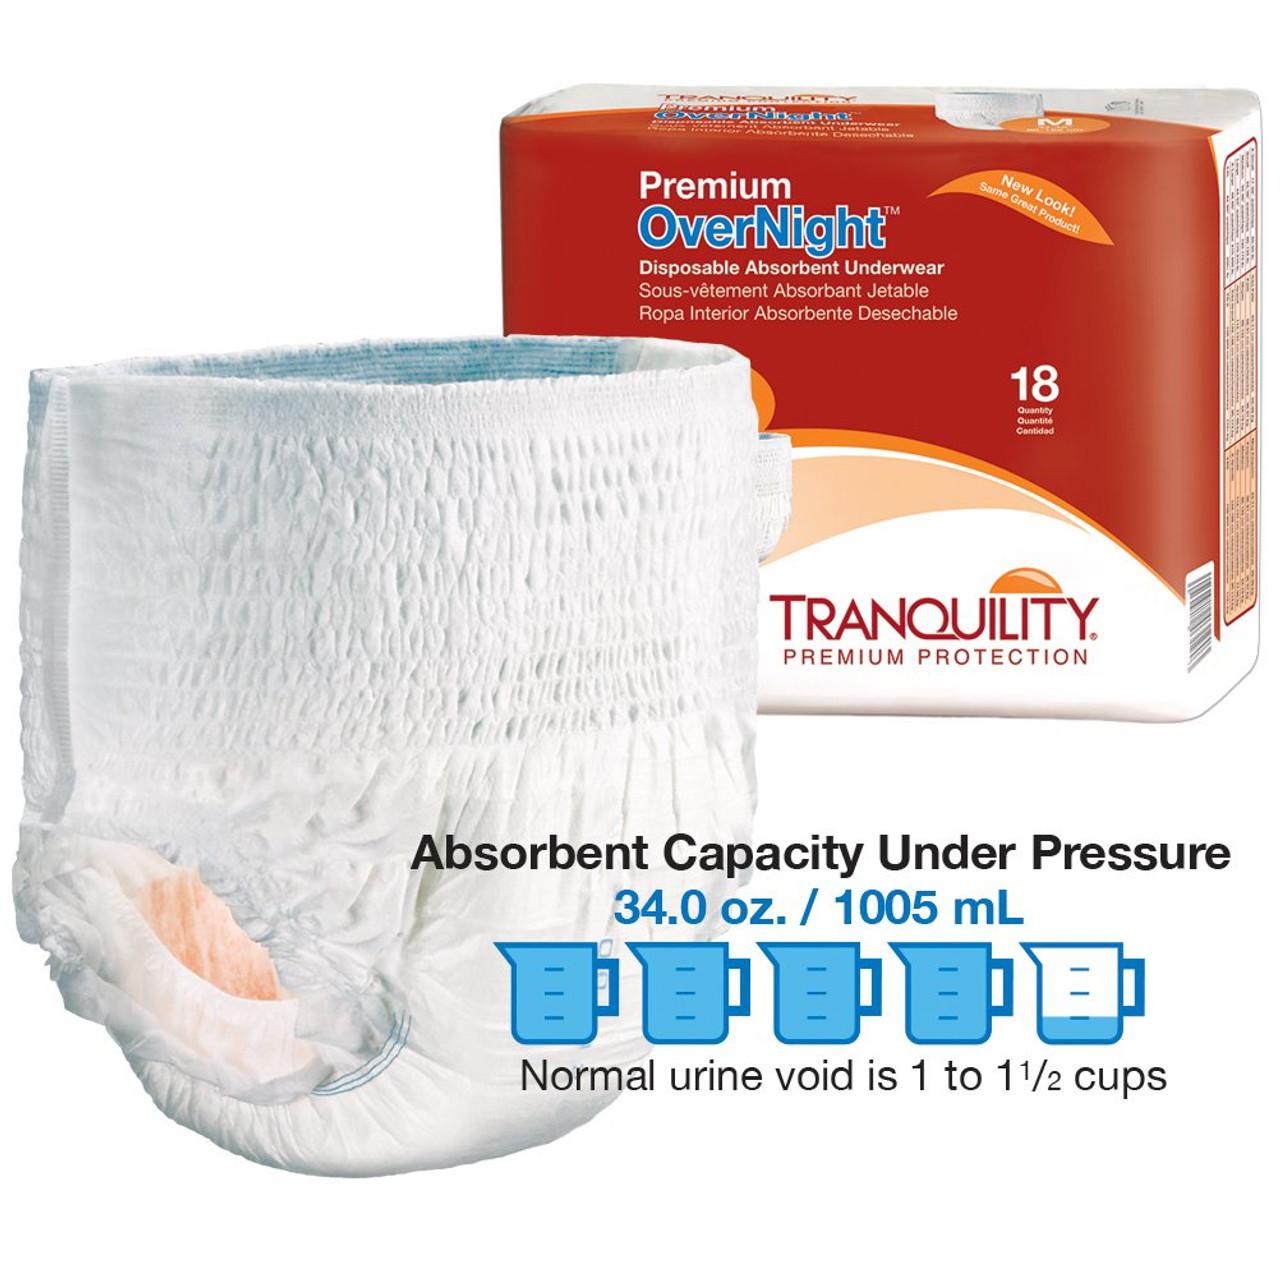 Tranquility Premium Overnight Underwear Disposable